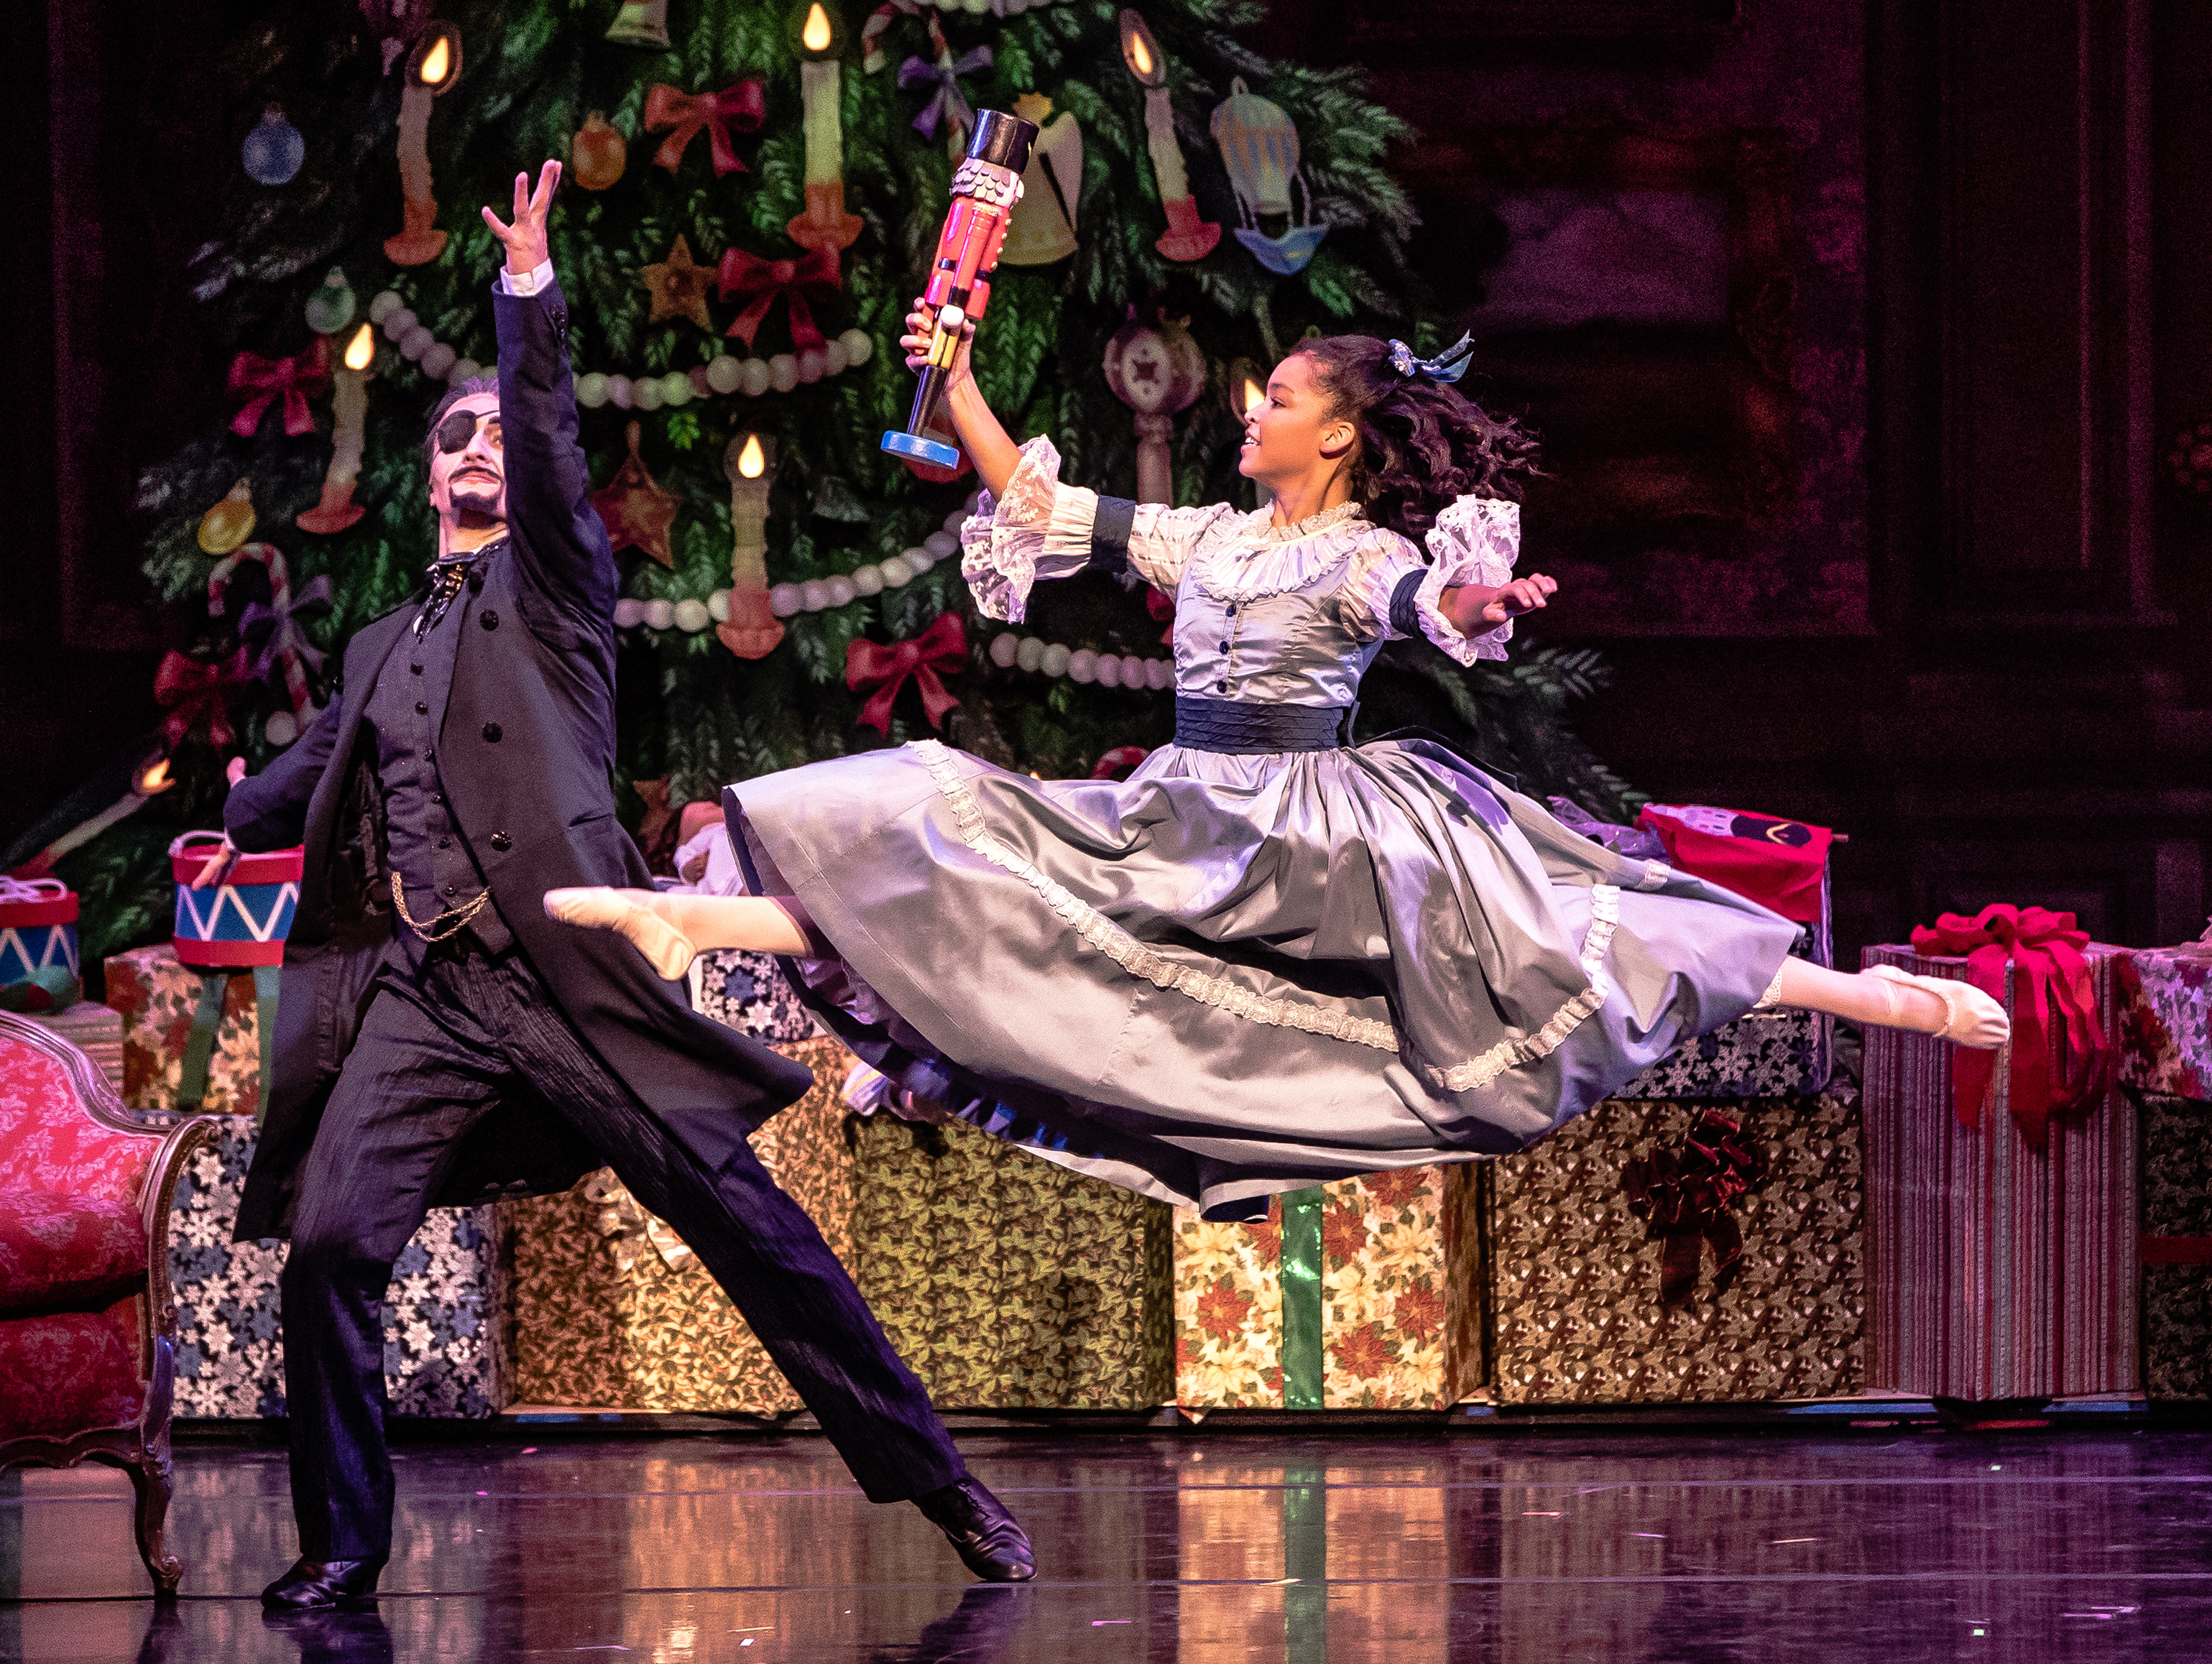 BWW Review: THE NUTCRACKER at Kansas City Ballet